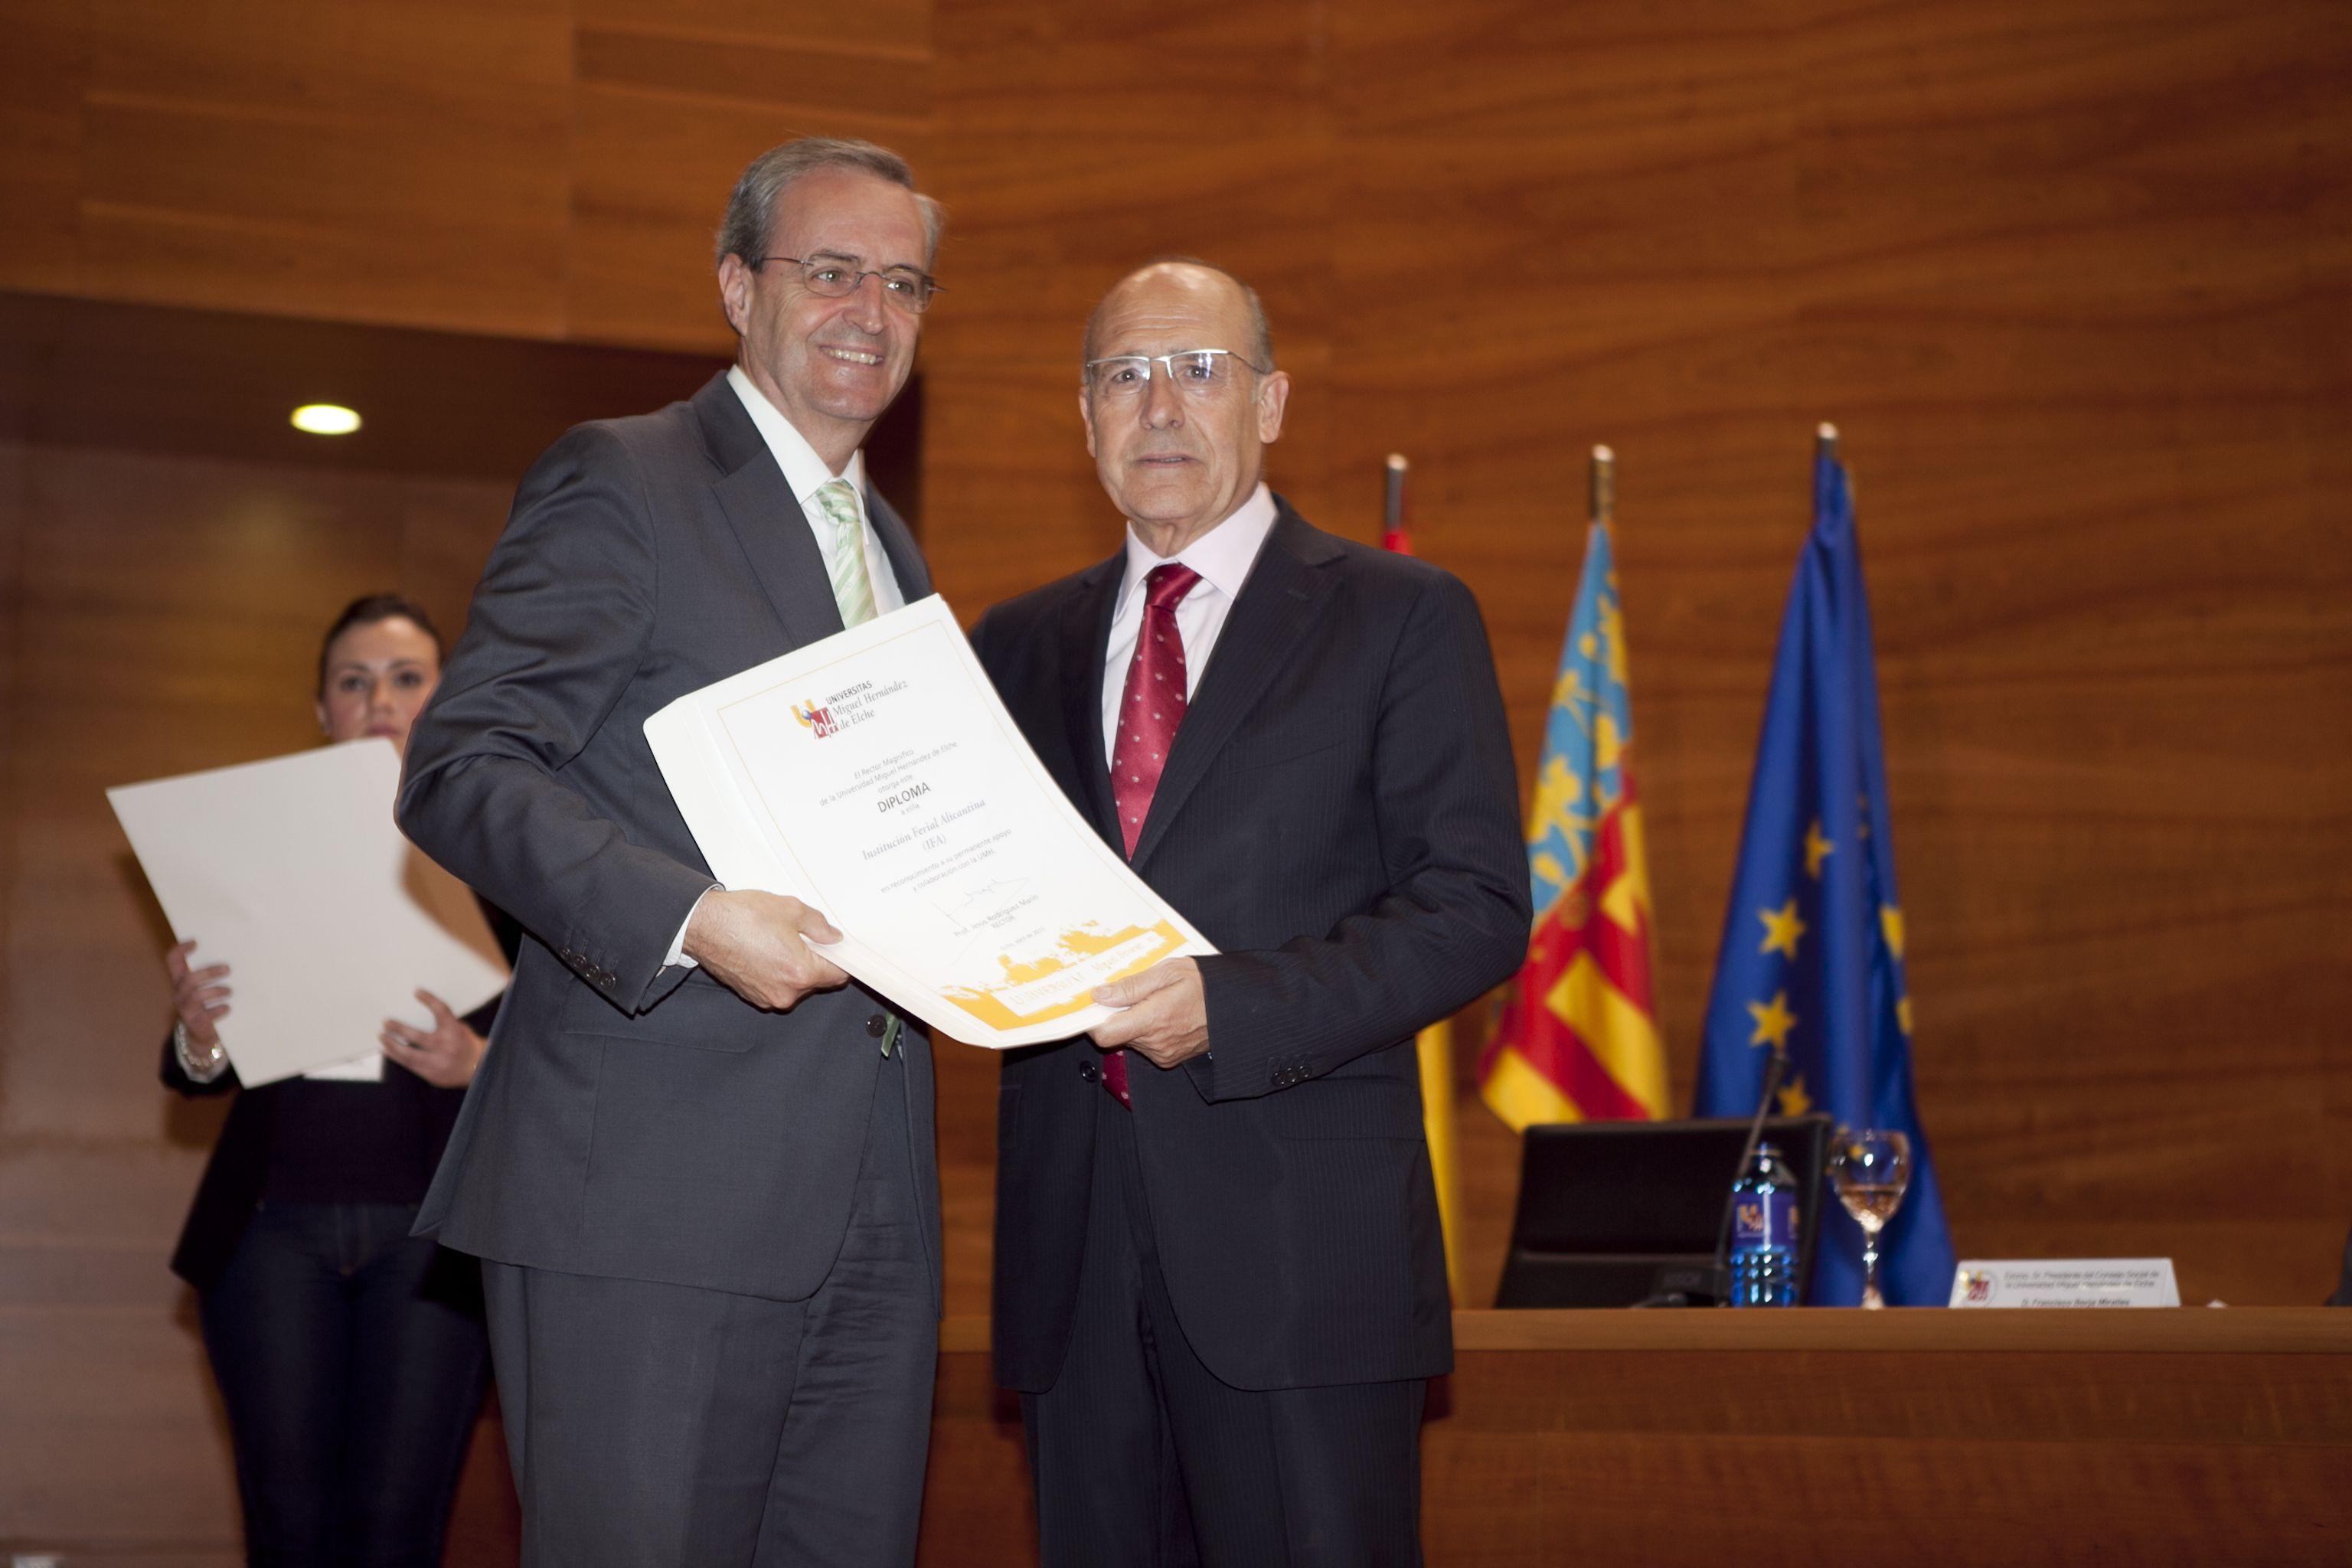 umh-diplomas-rector_mg_6649.jpg